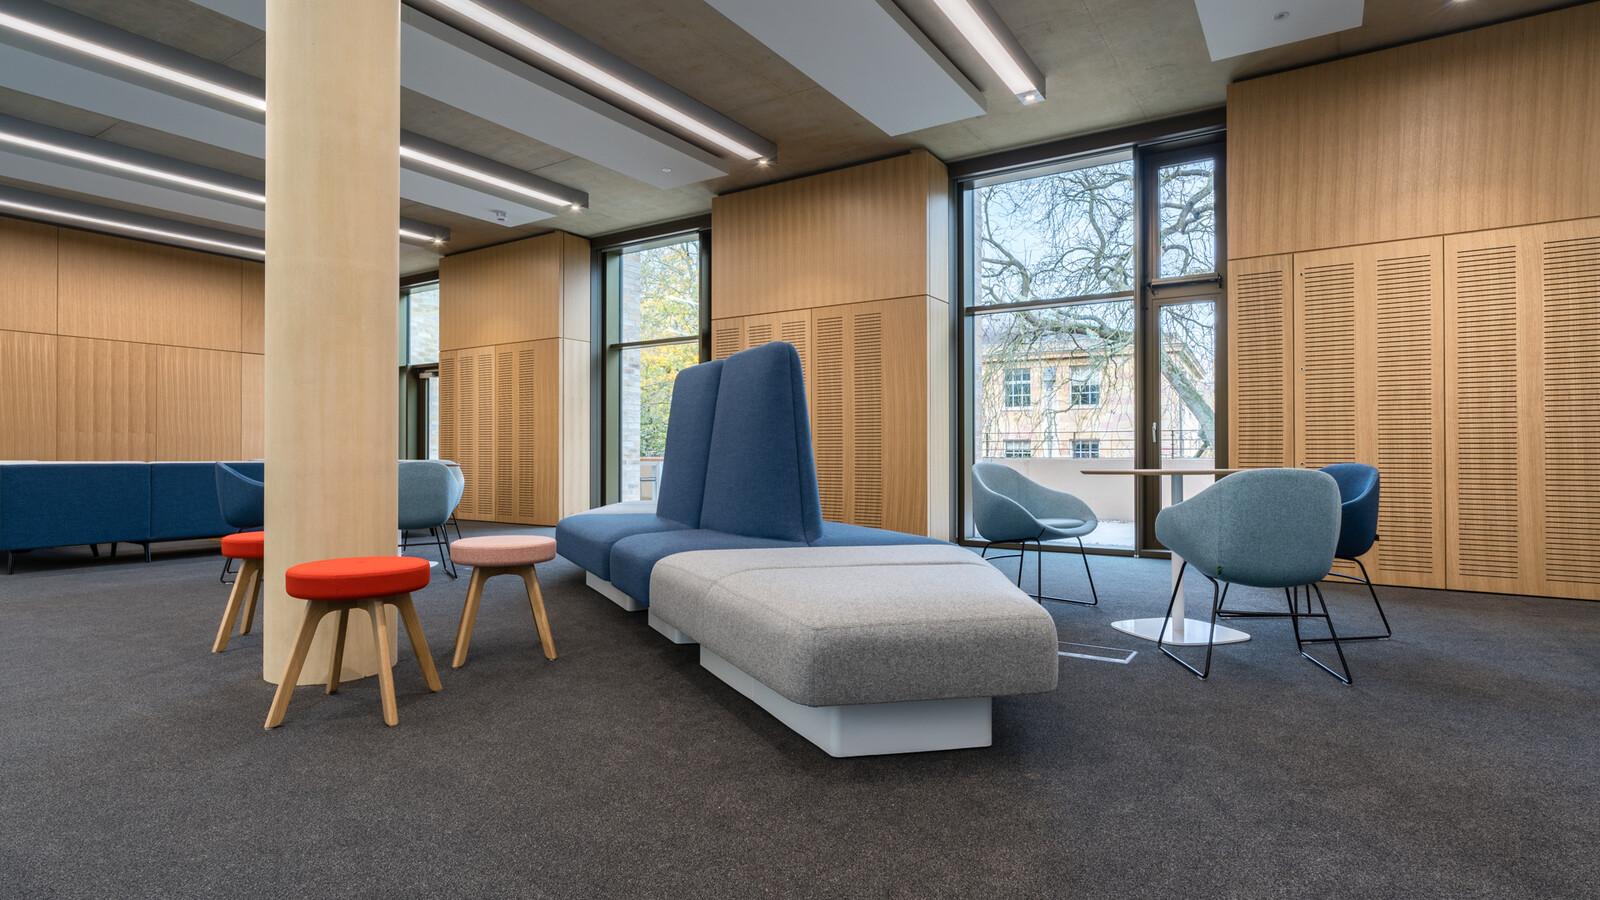 Cambridge University - Judge Business School